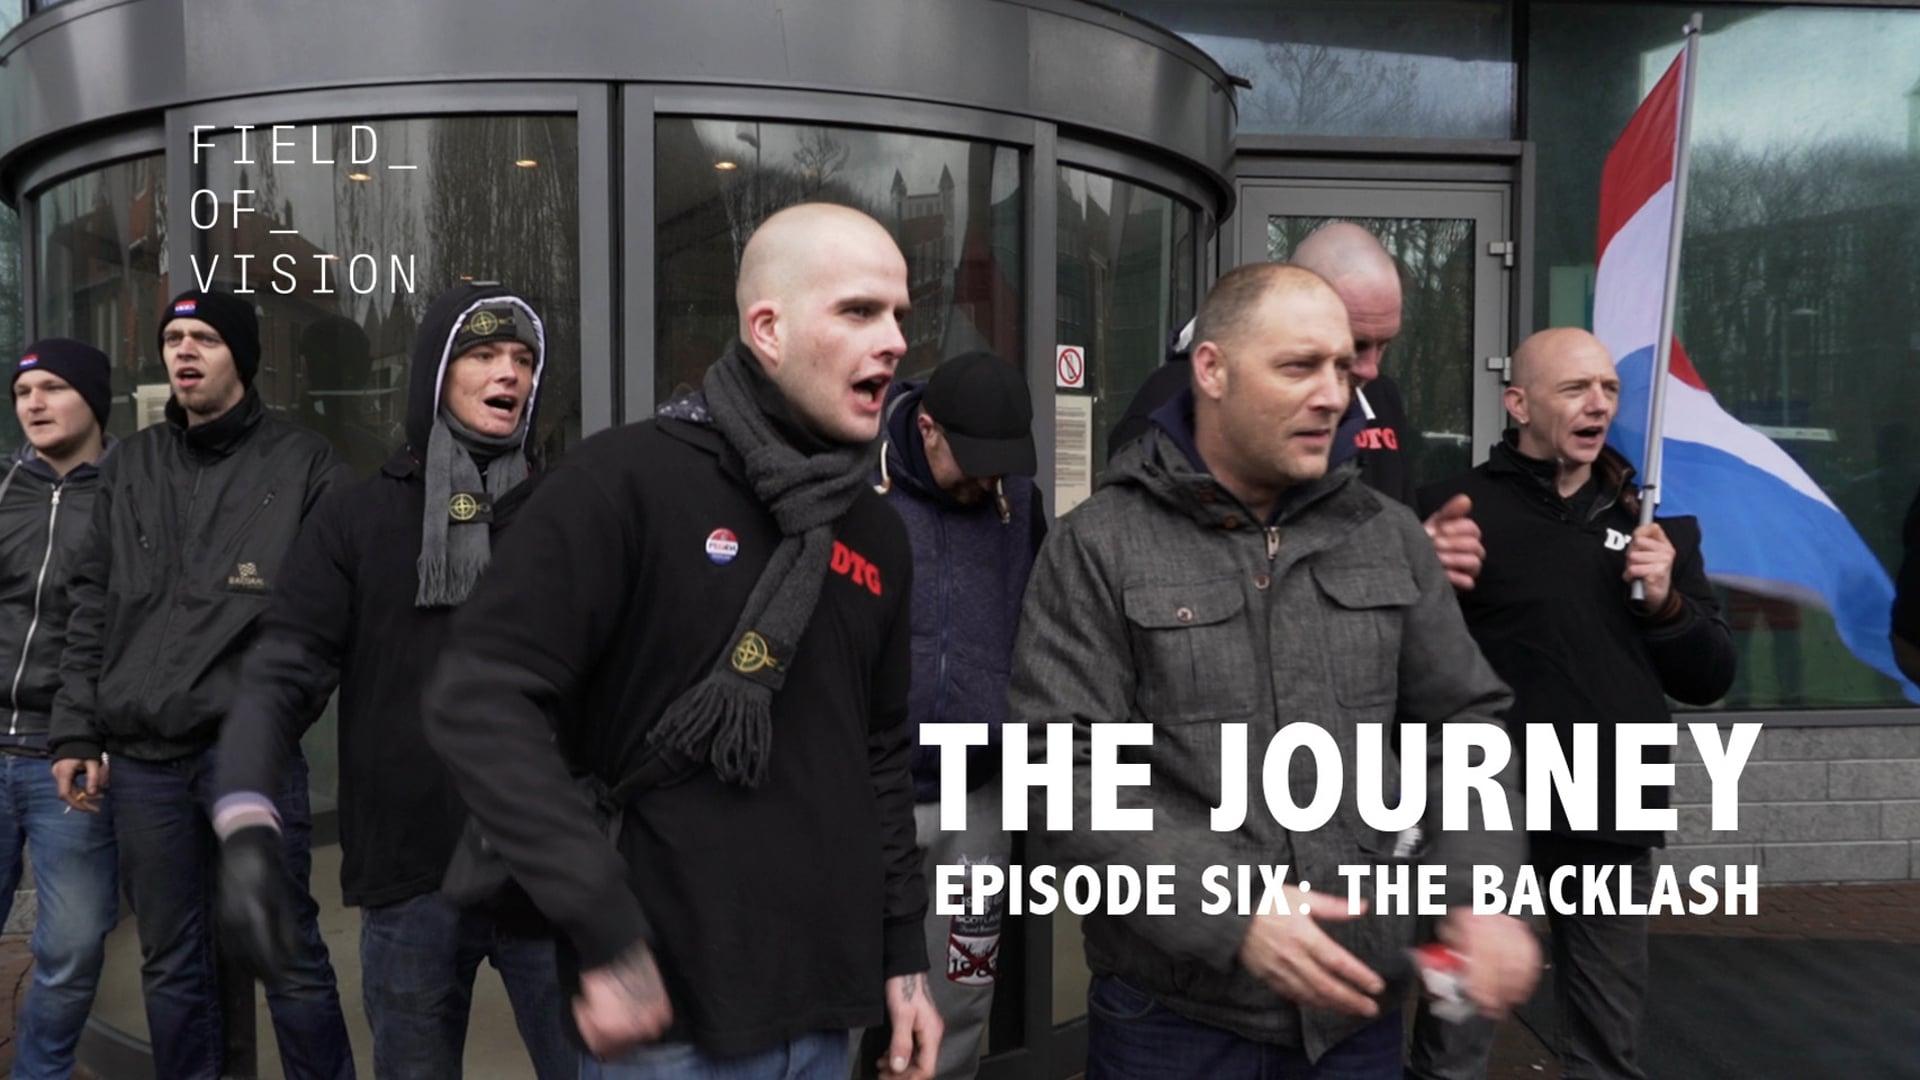 Episode Six: The Backlash